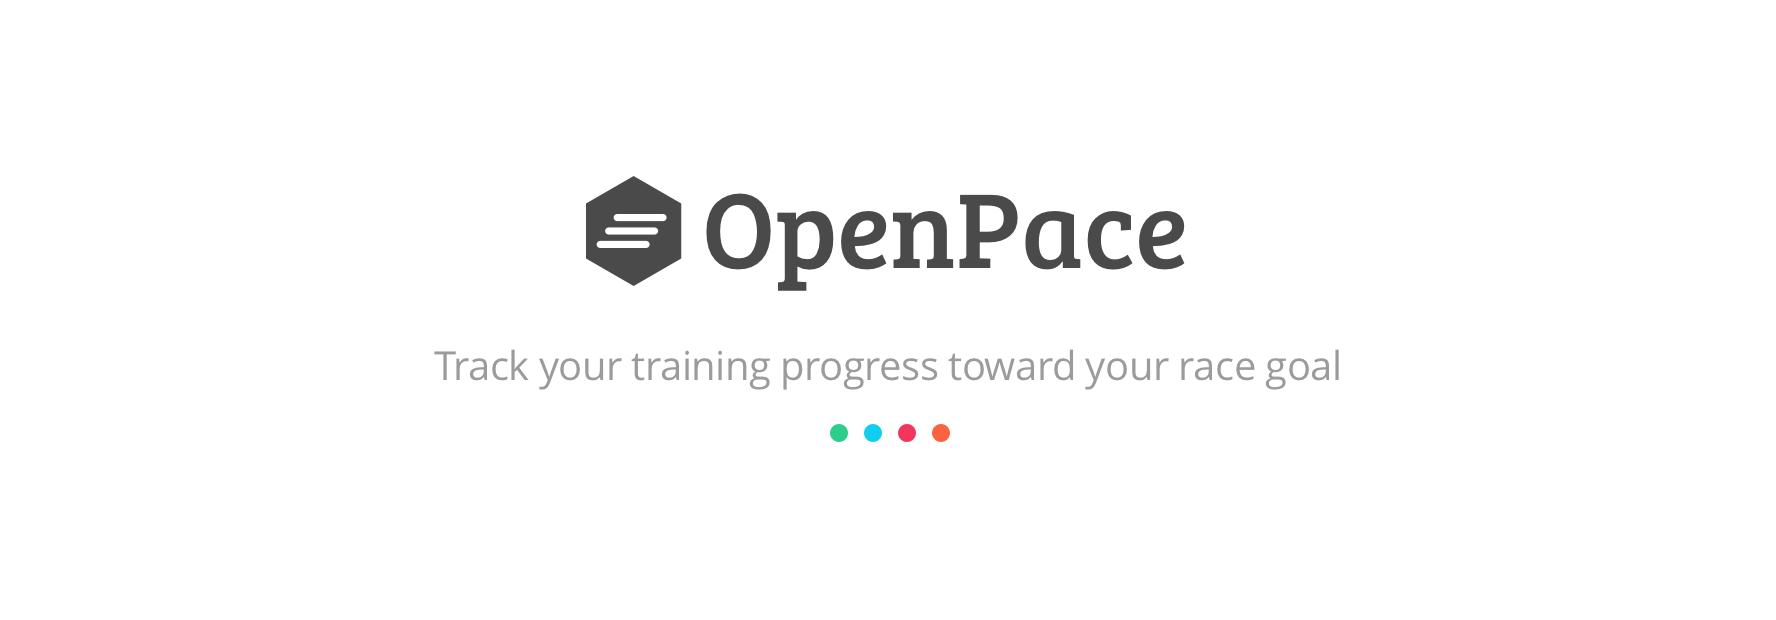 OpenPace